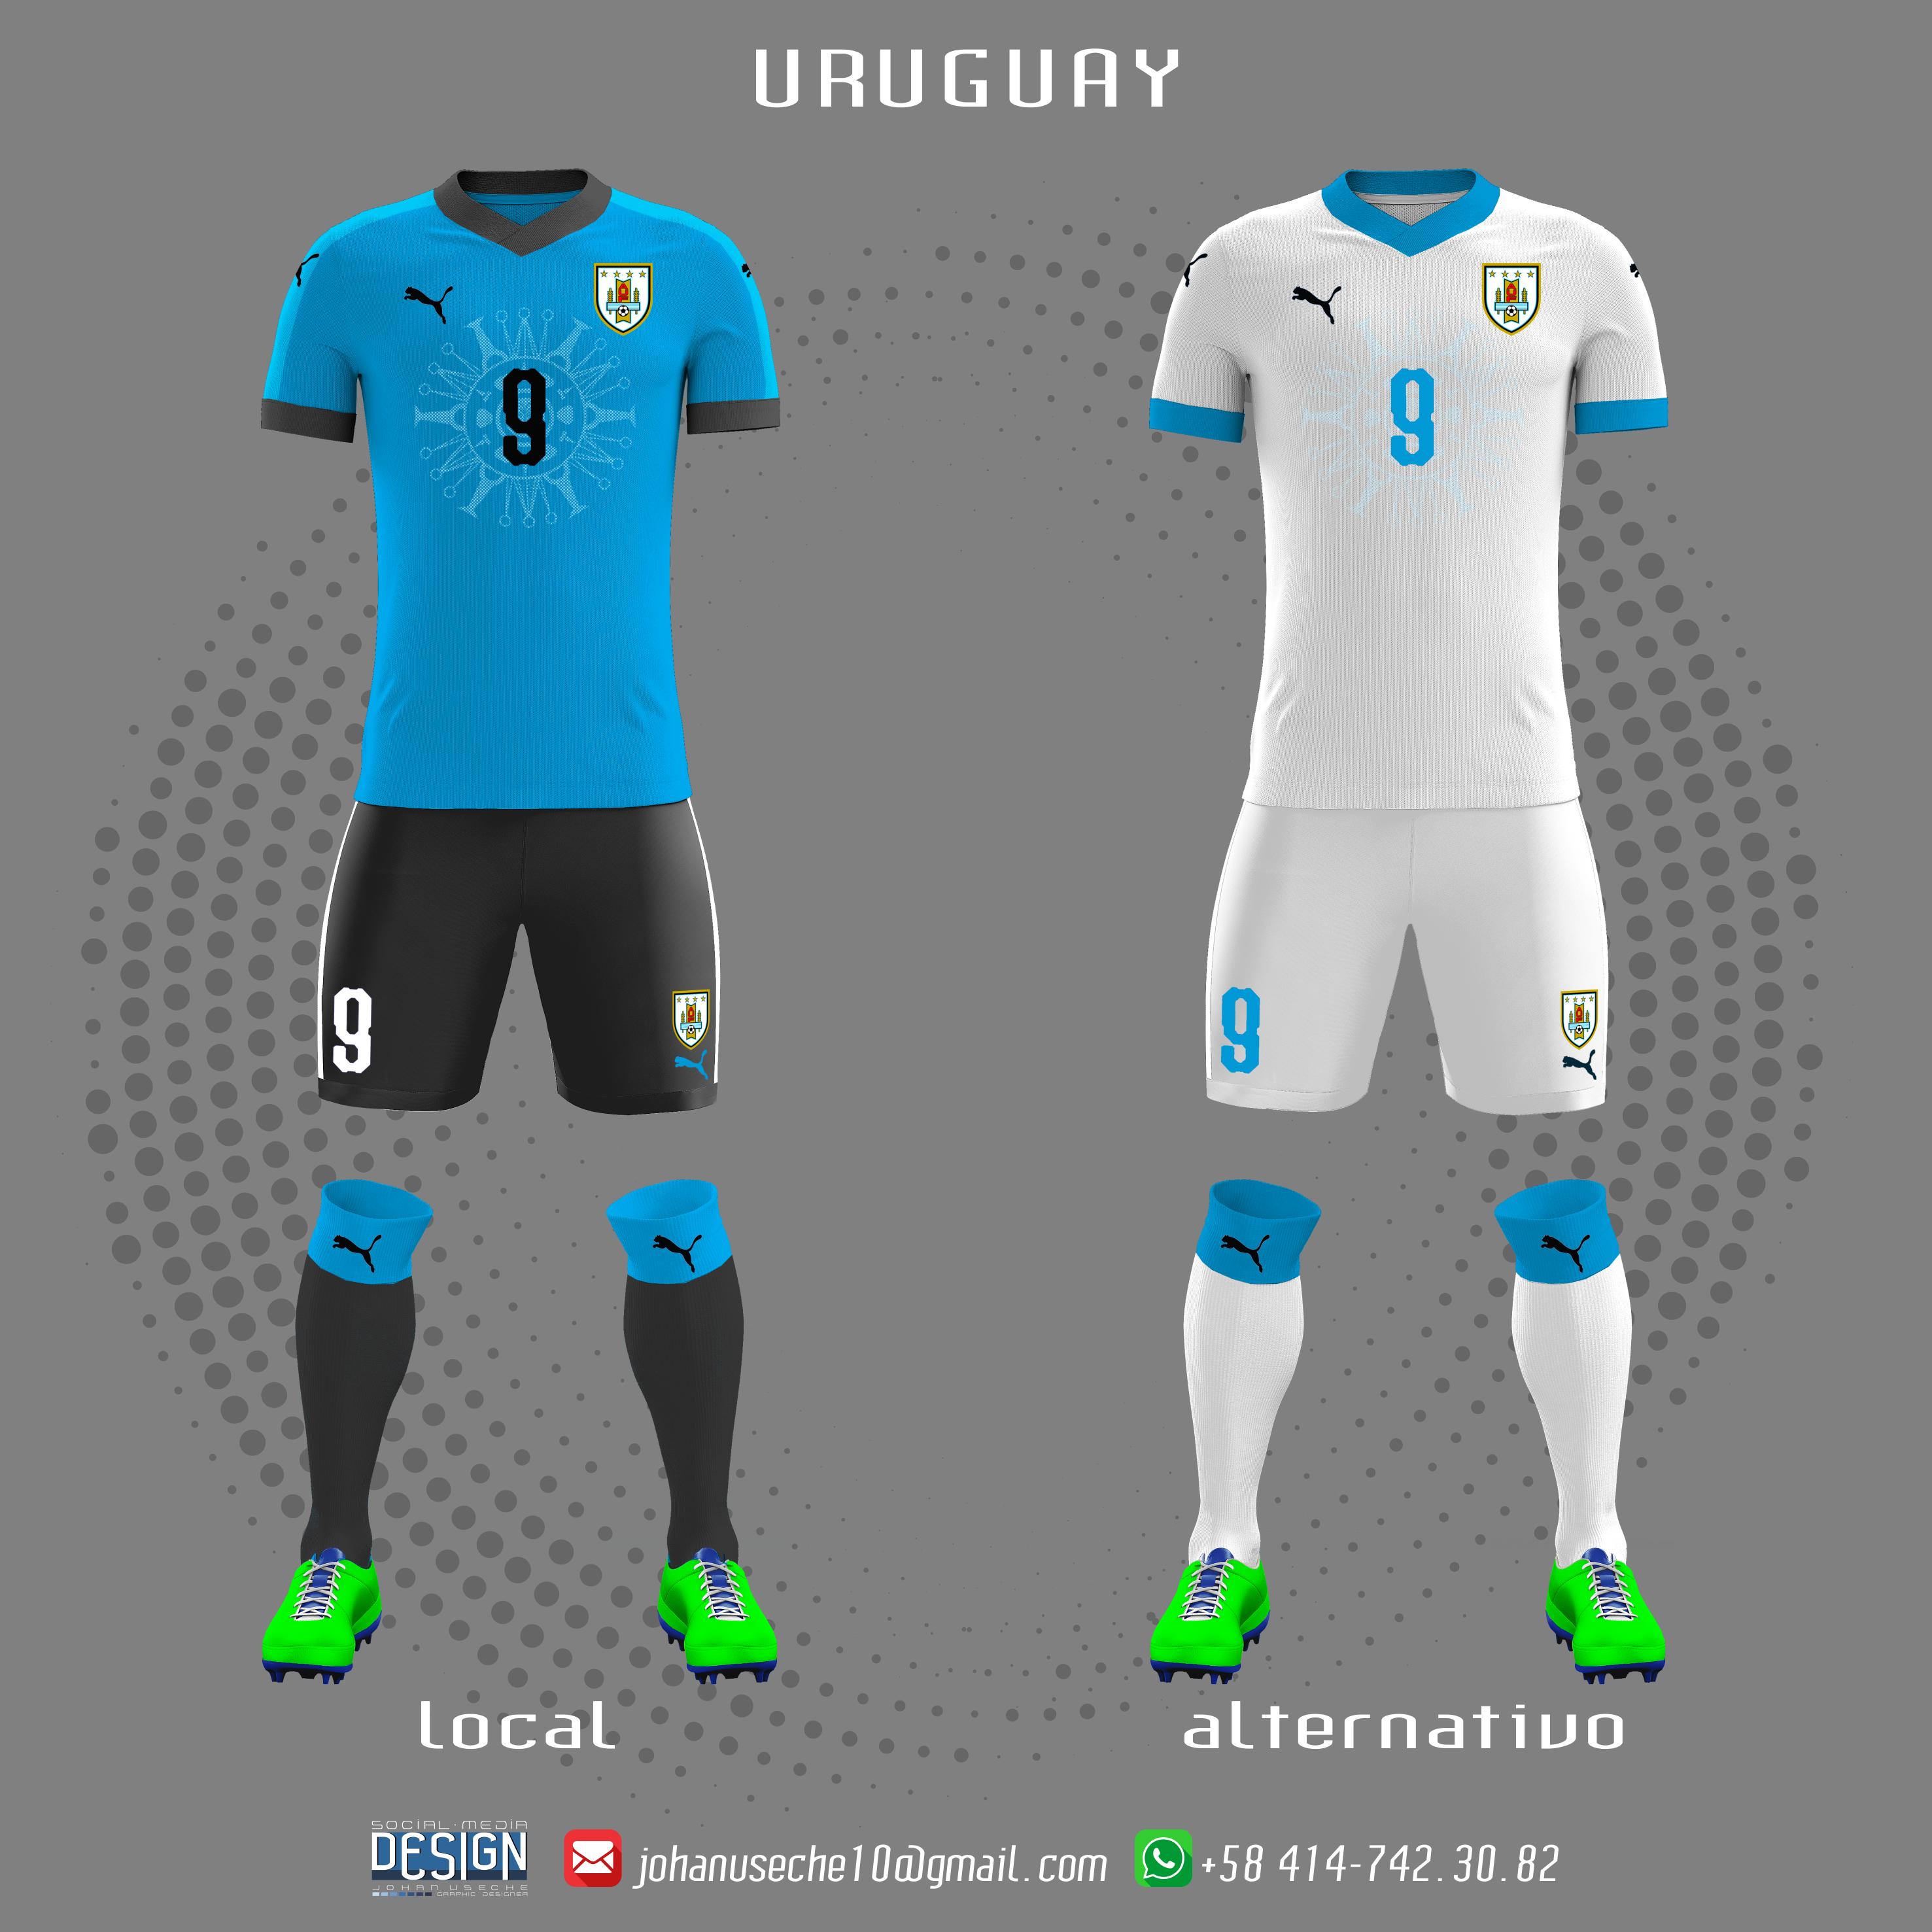 b517704755c kit Uruguay copa américa 2019 (no oficial)